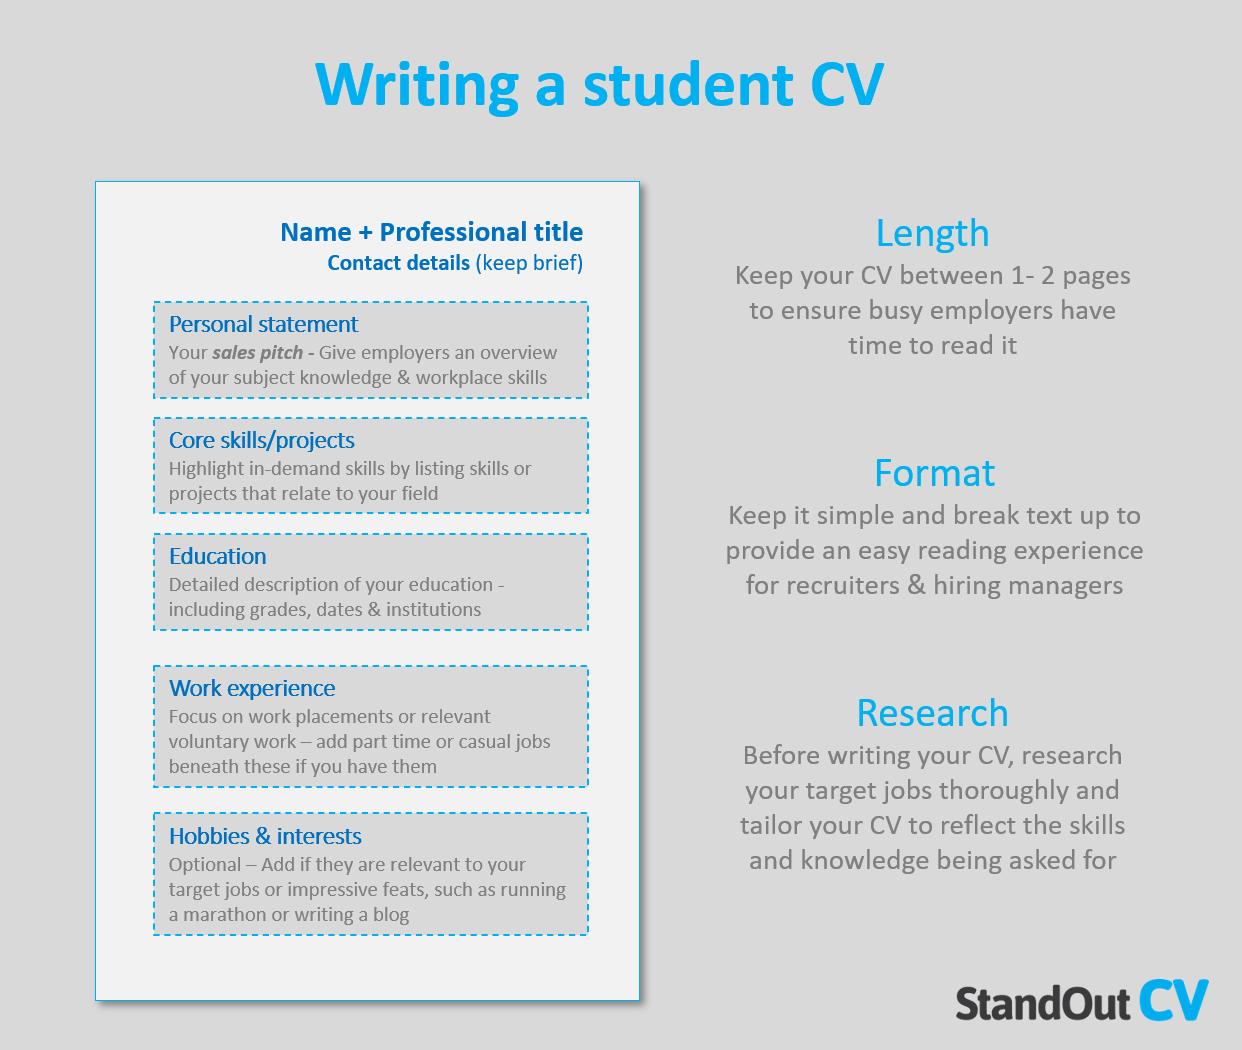 Student CV writing guide